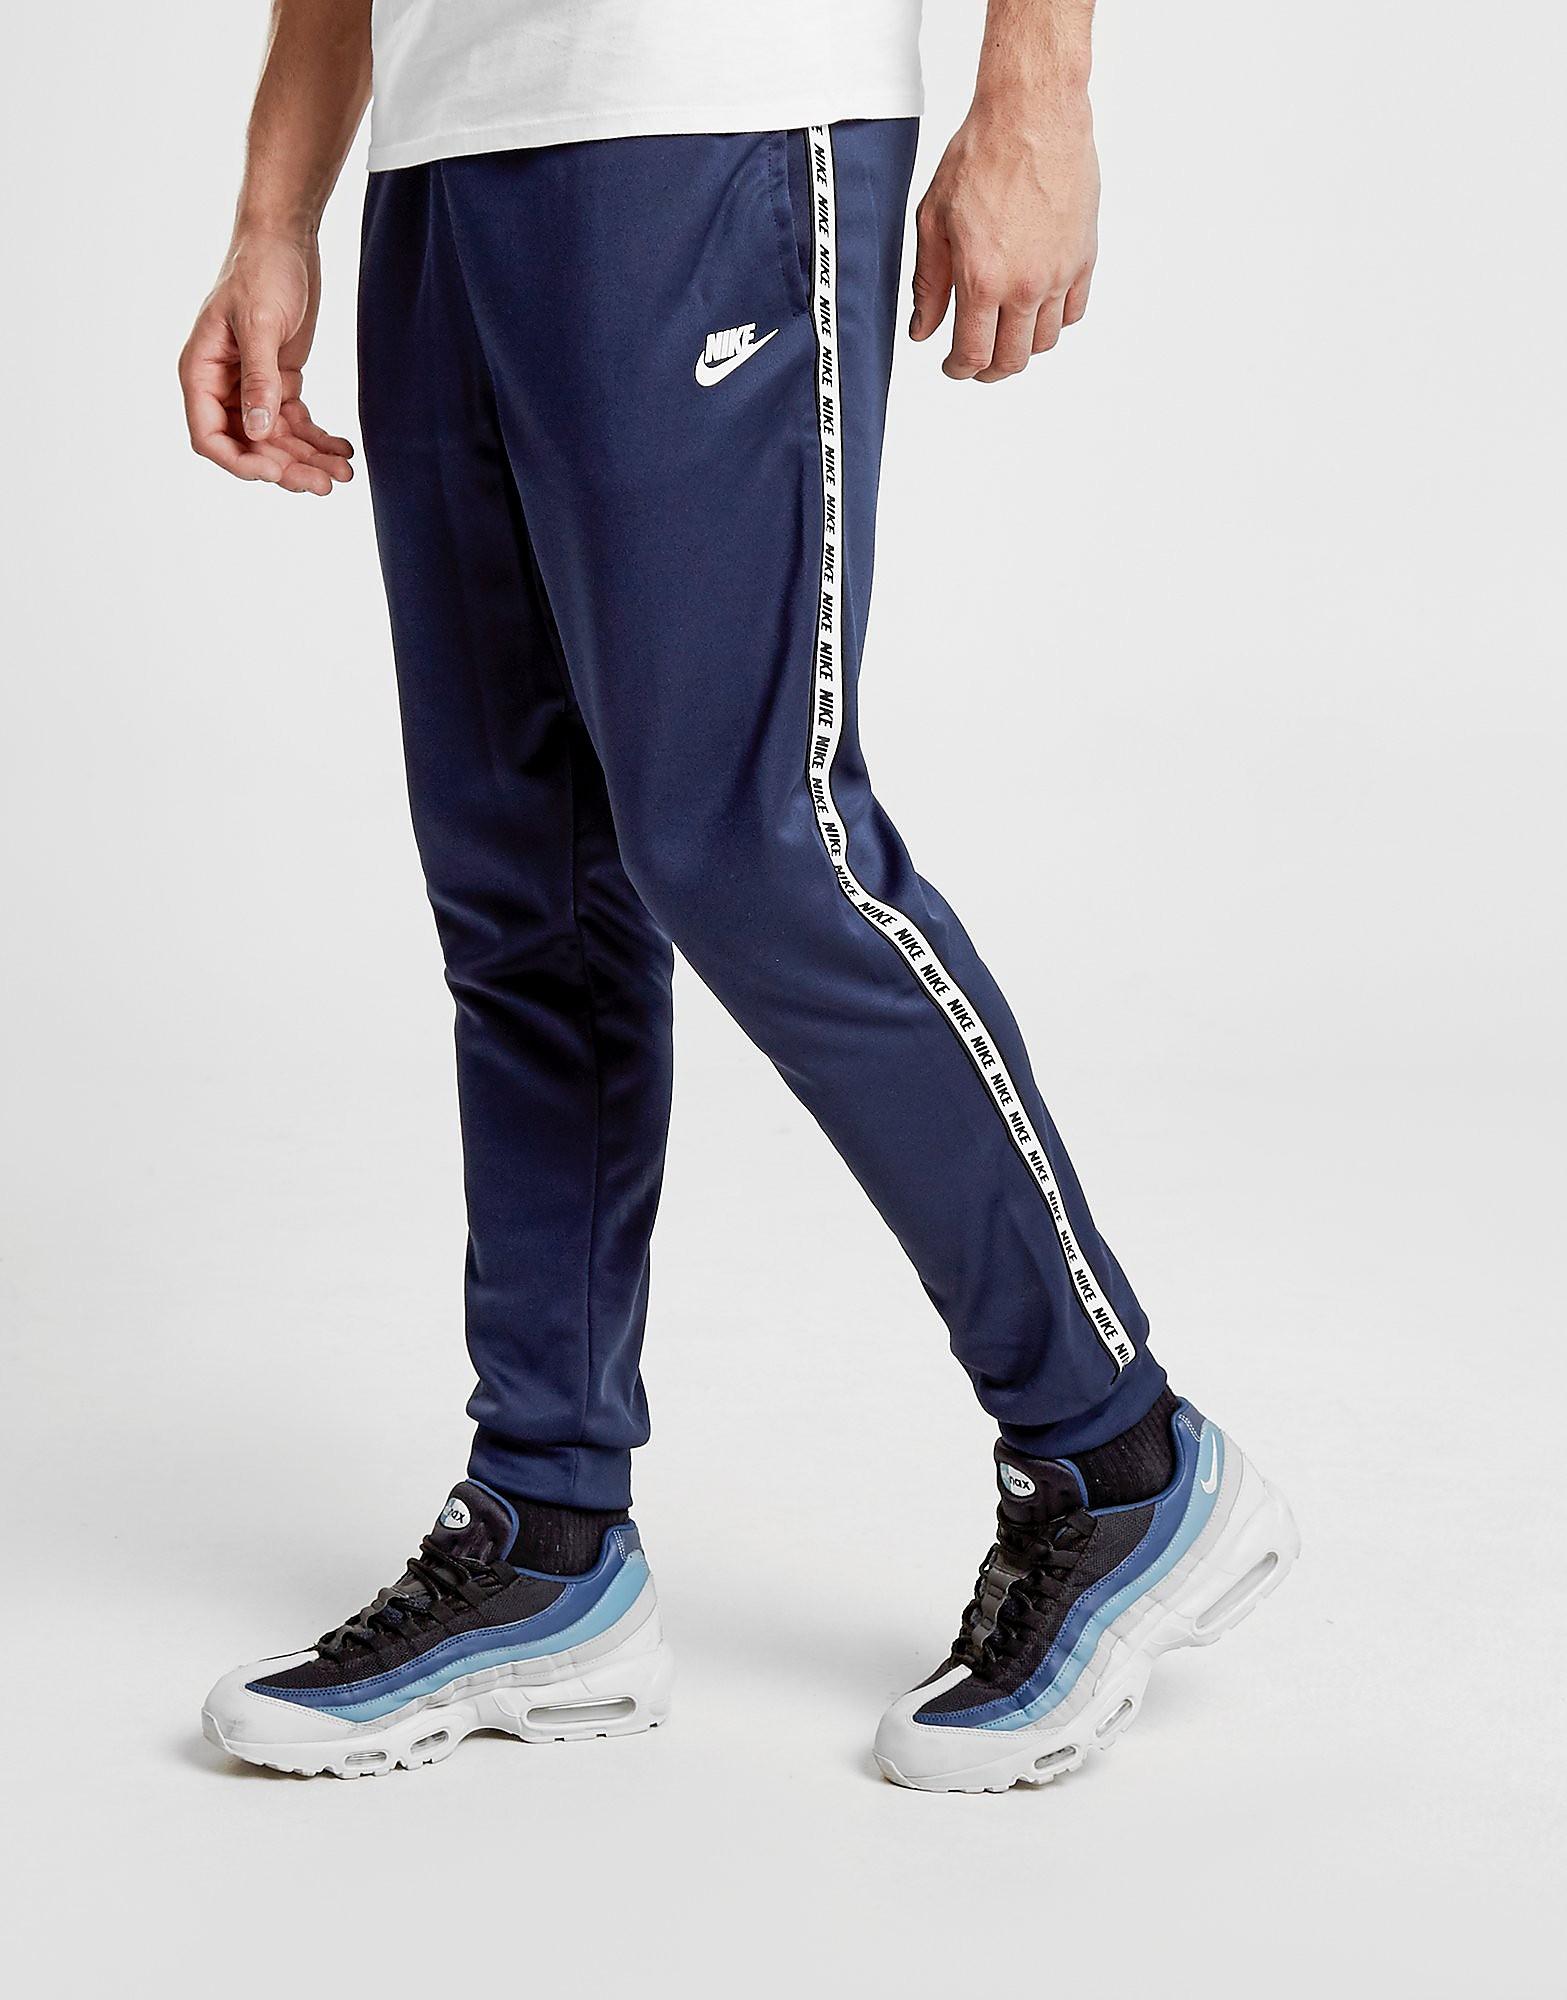 Nike pantalón de chándal Gel Tape Cuffed